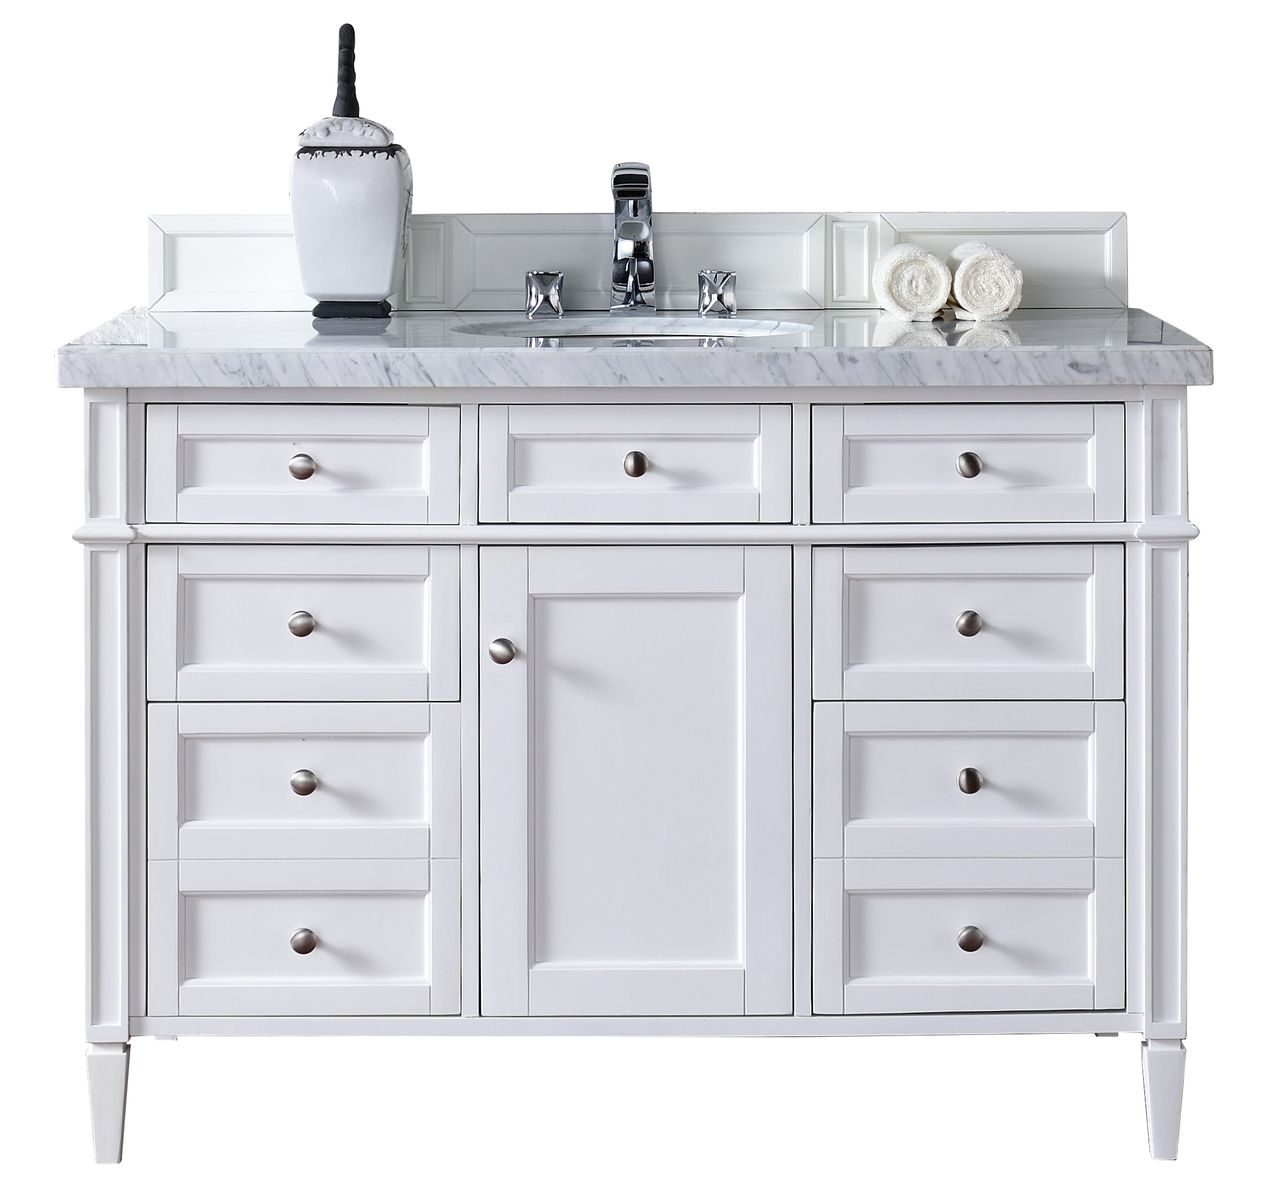 Brittany 48 Cottage White Bathroom Vanity James Martin Bathrooms Pinterest Cottages